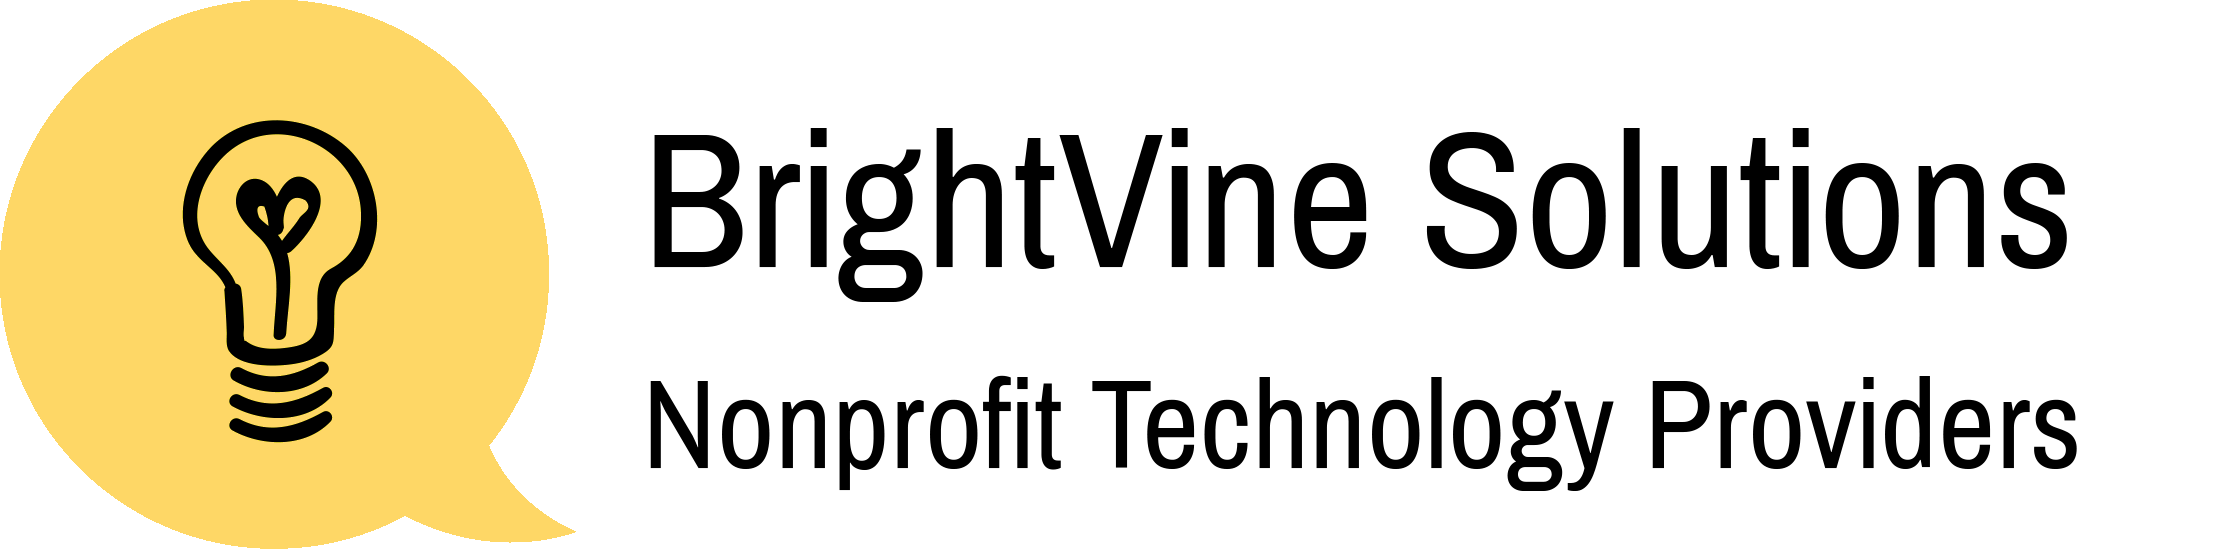 Brightvine logo.png